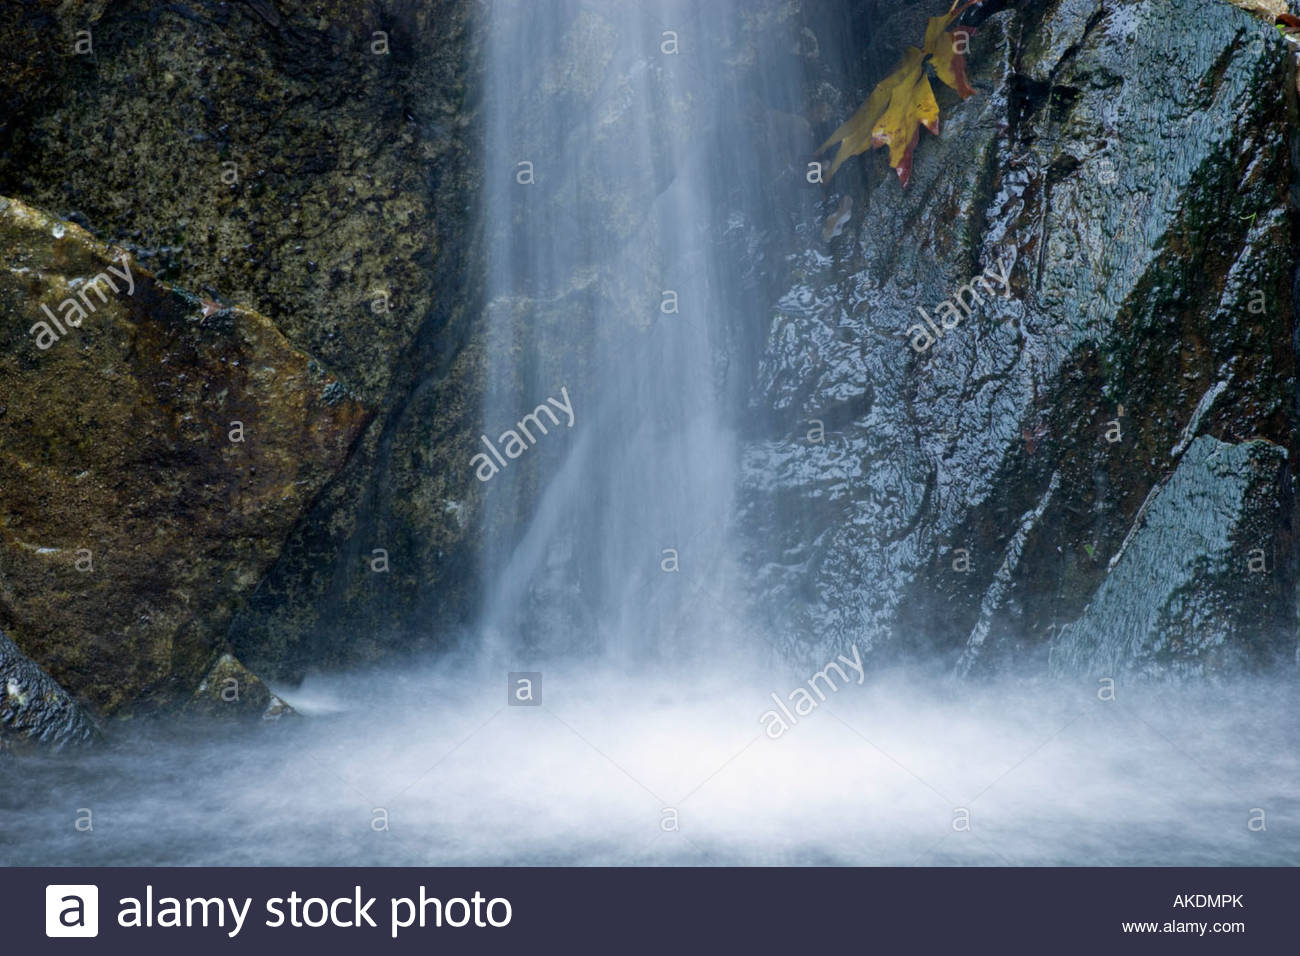 Sturtevant Falls Waterfall Cascades San Gabriel Mountains California - Stock Image